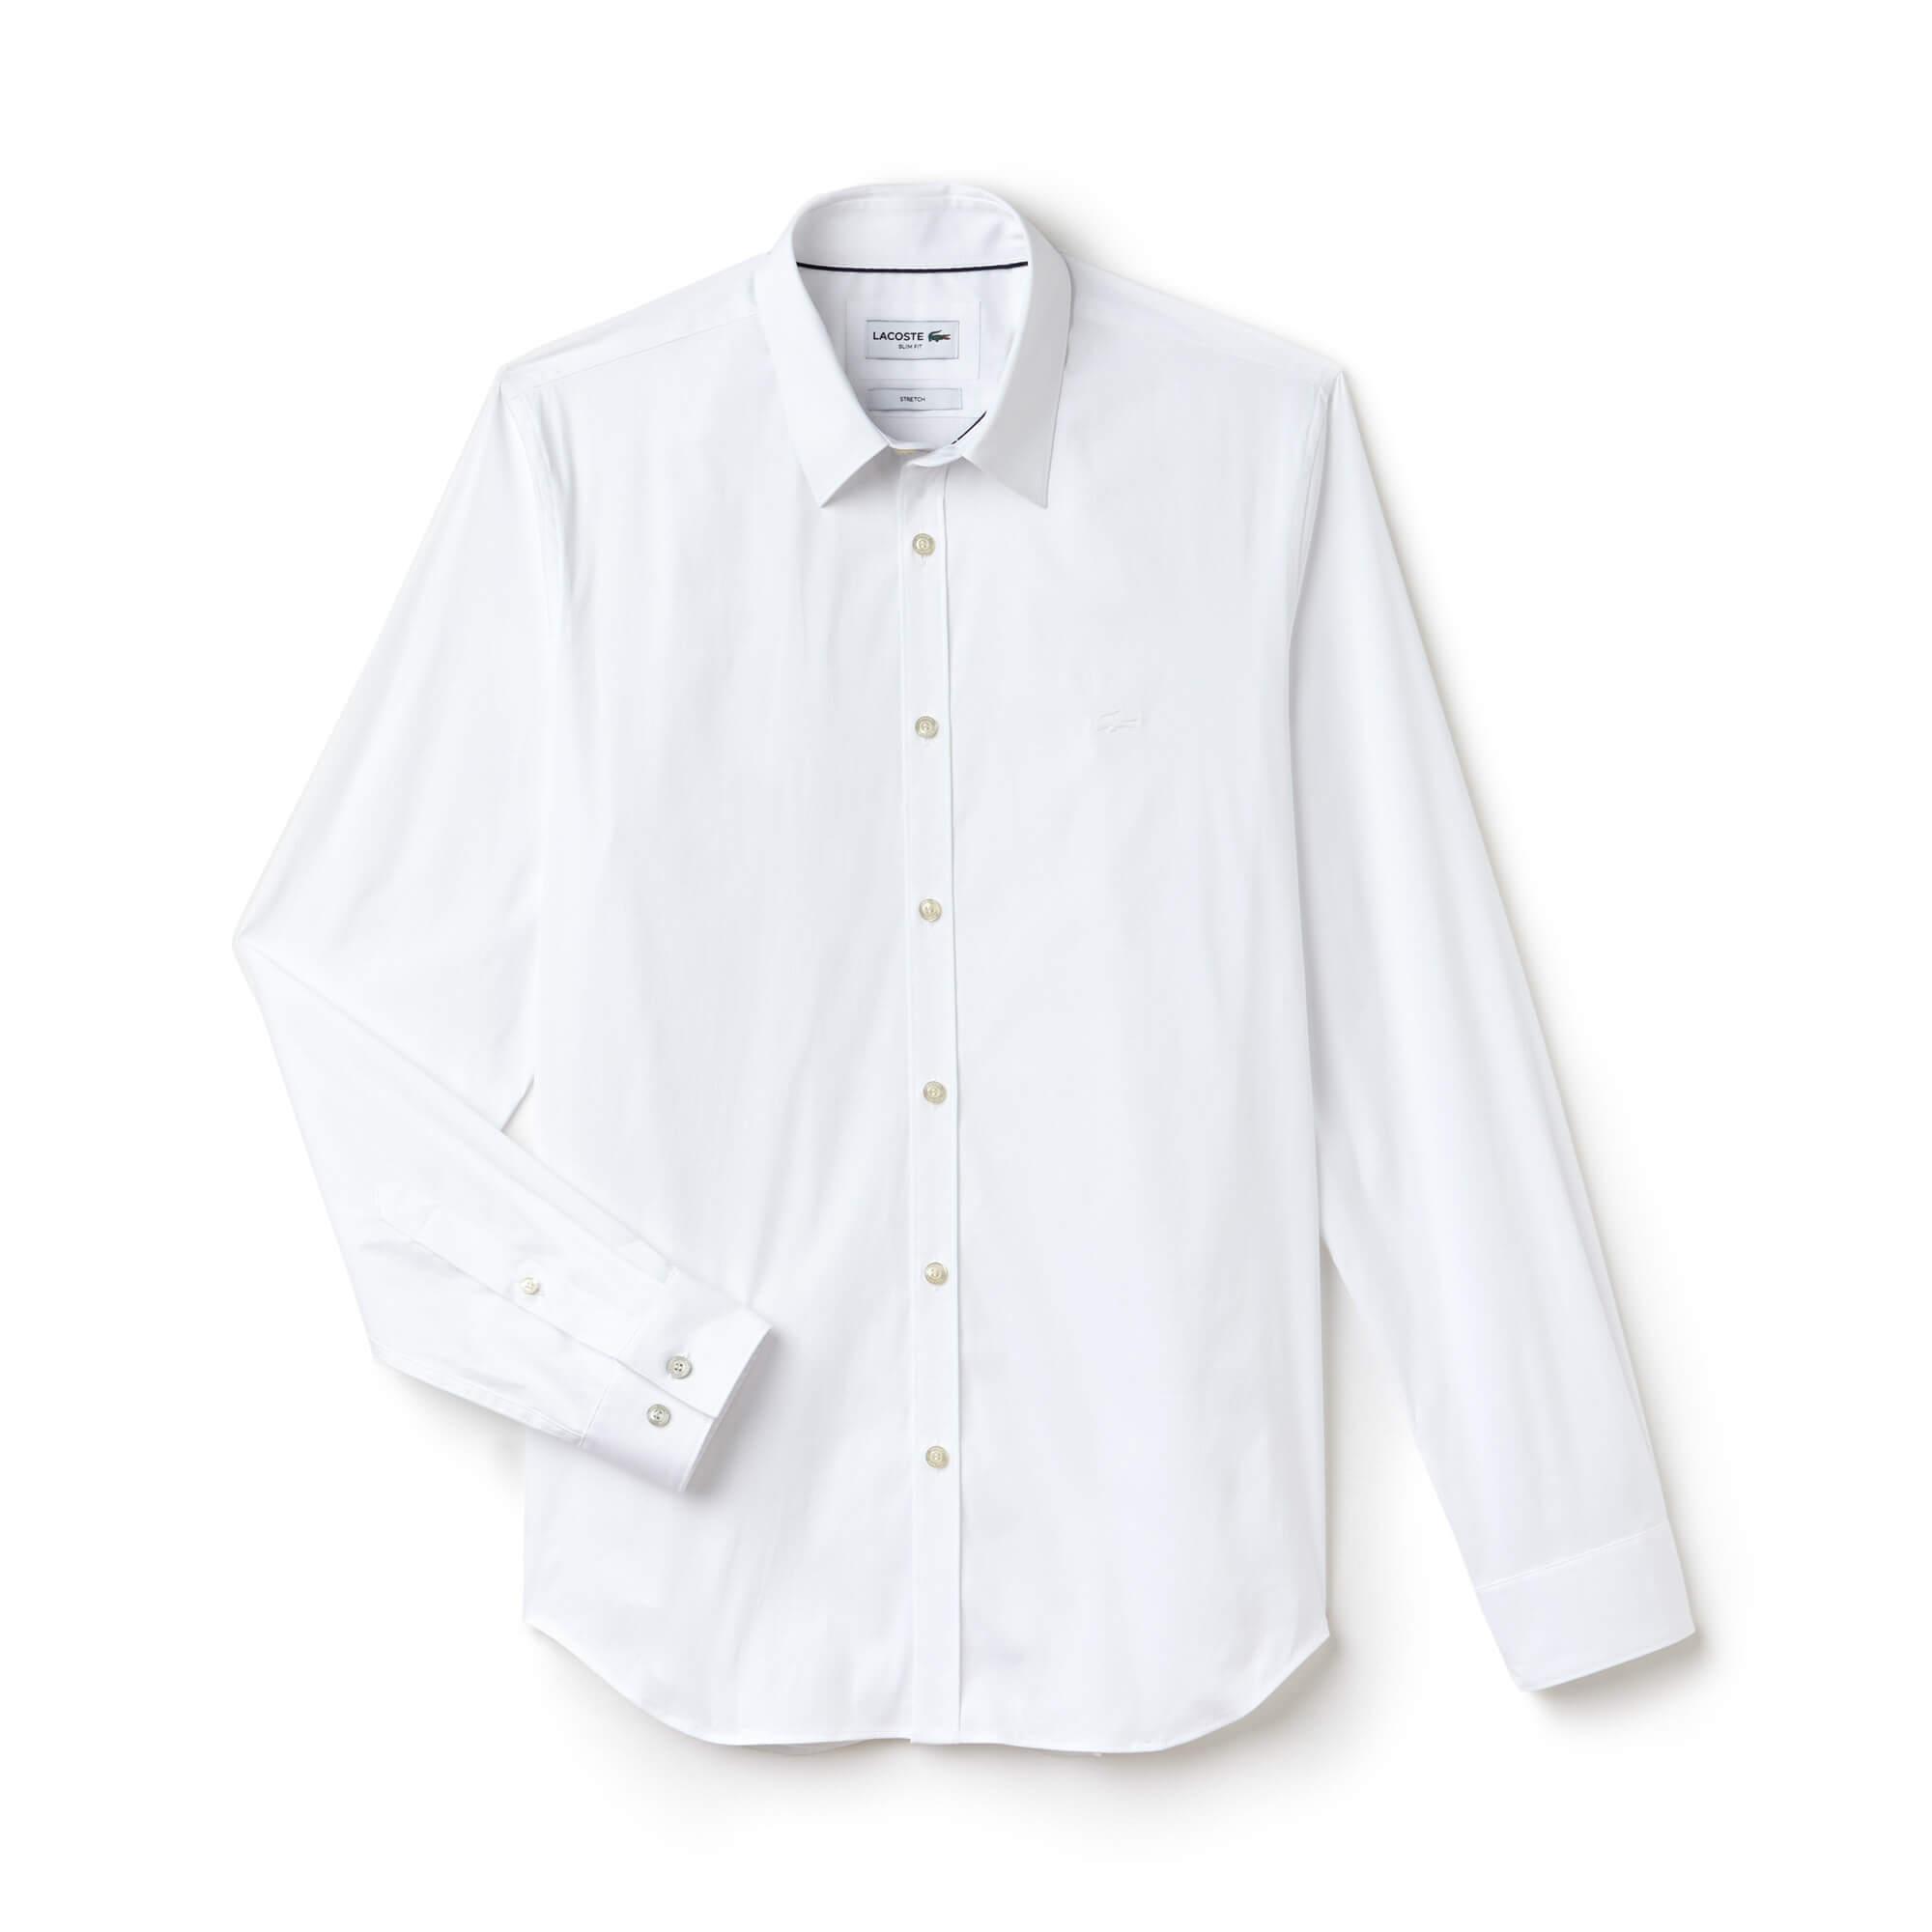 Lacoste Men's Long Sleeve Wovens Shirts